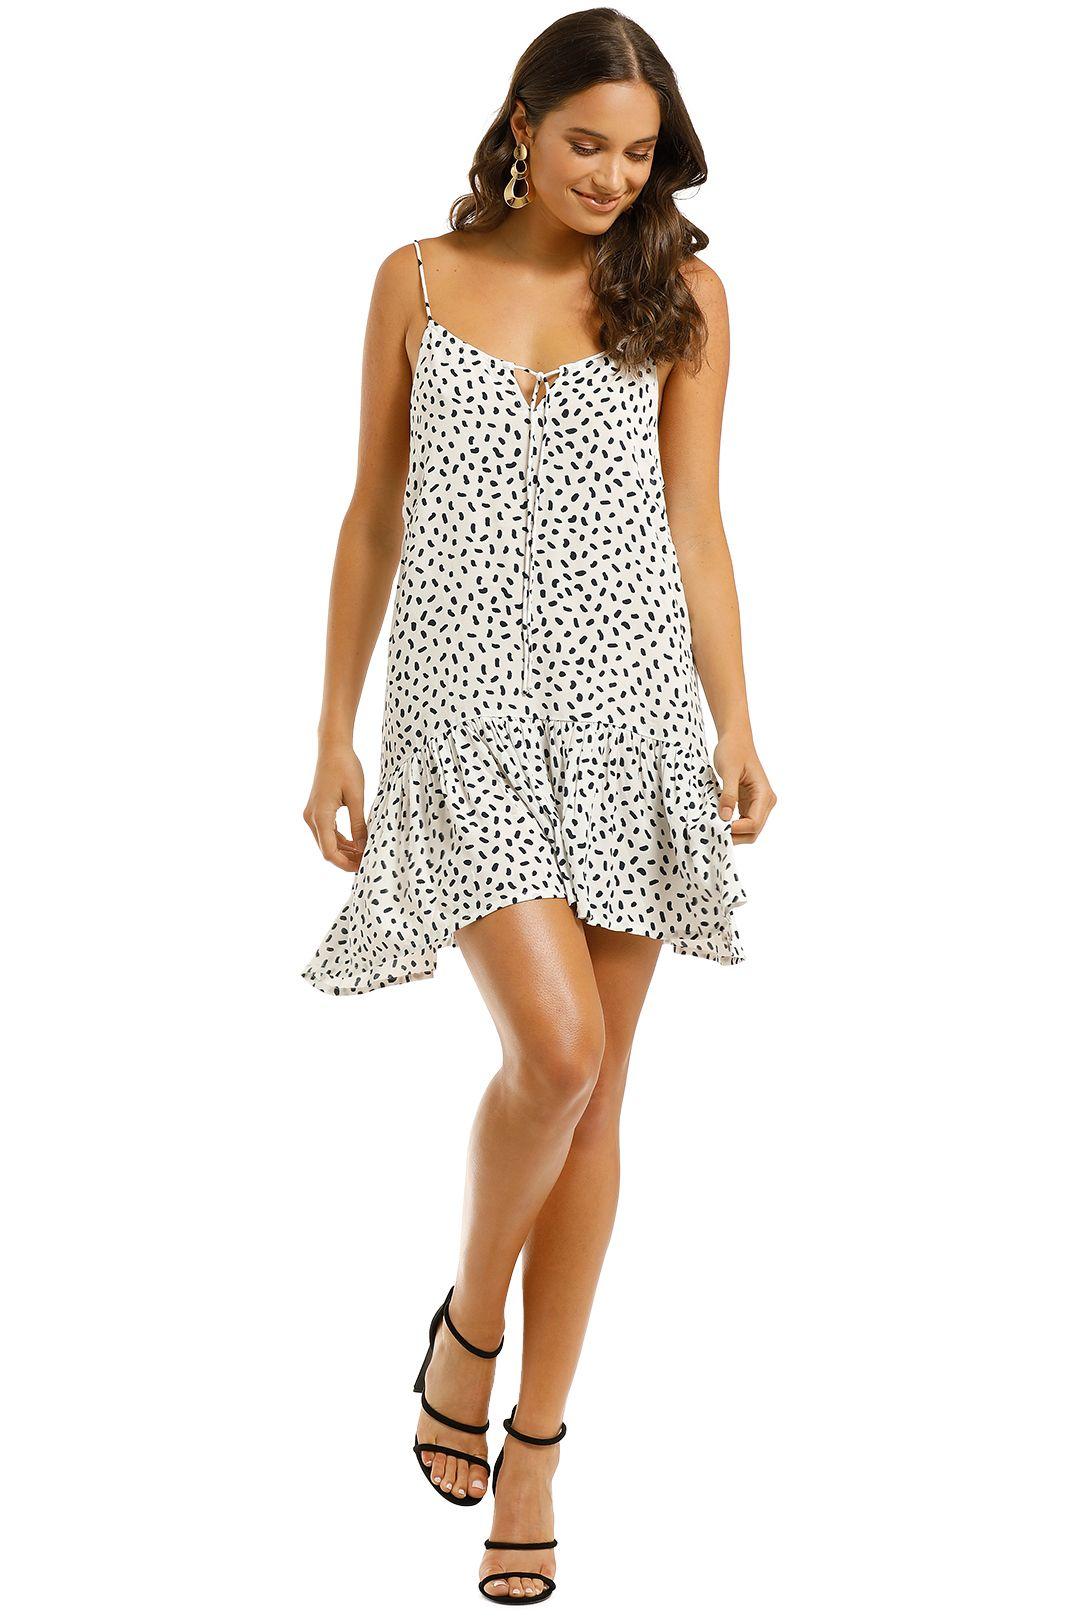 Rue-Stiic-Sutton-Mini-Dress-Polka-Stroke-Ink-Front